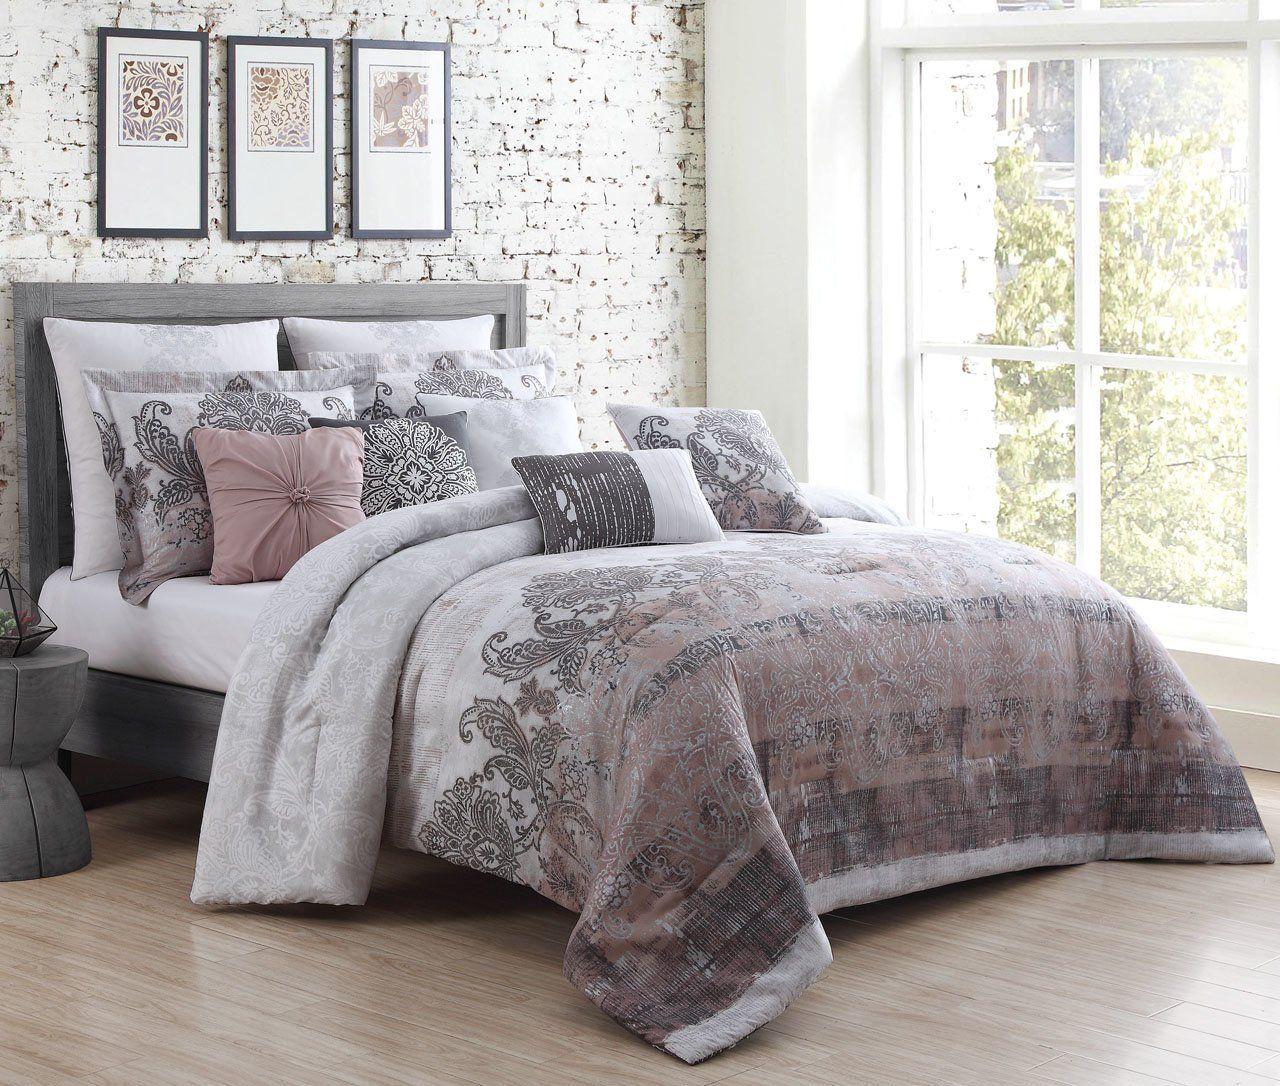 10 Piece Antonella Blush Charcoal Comforter Set Coverlet Set King Quilt Sets Quilt Sets